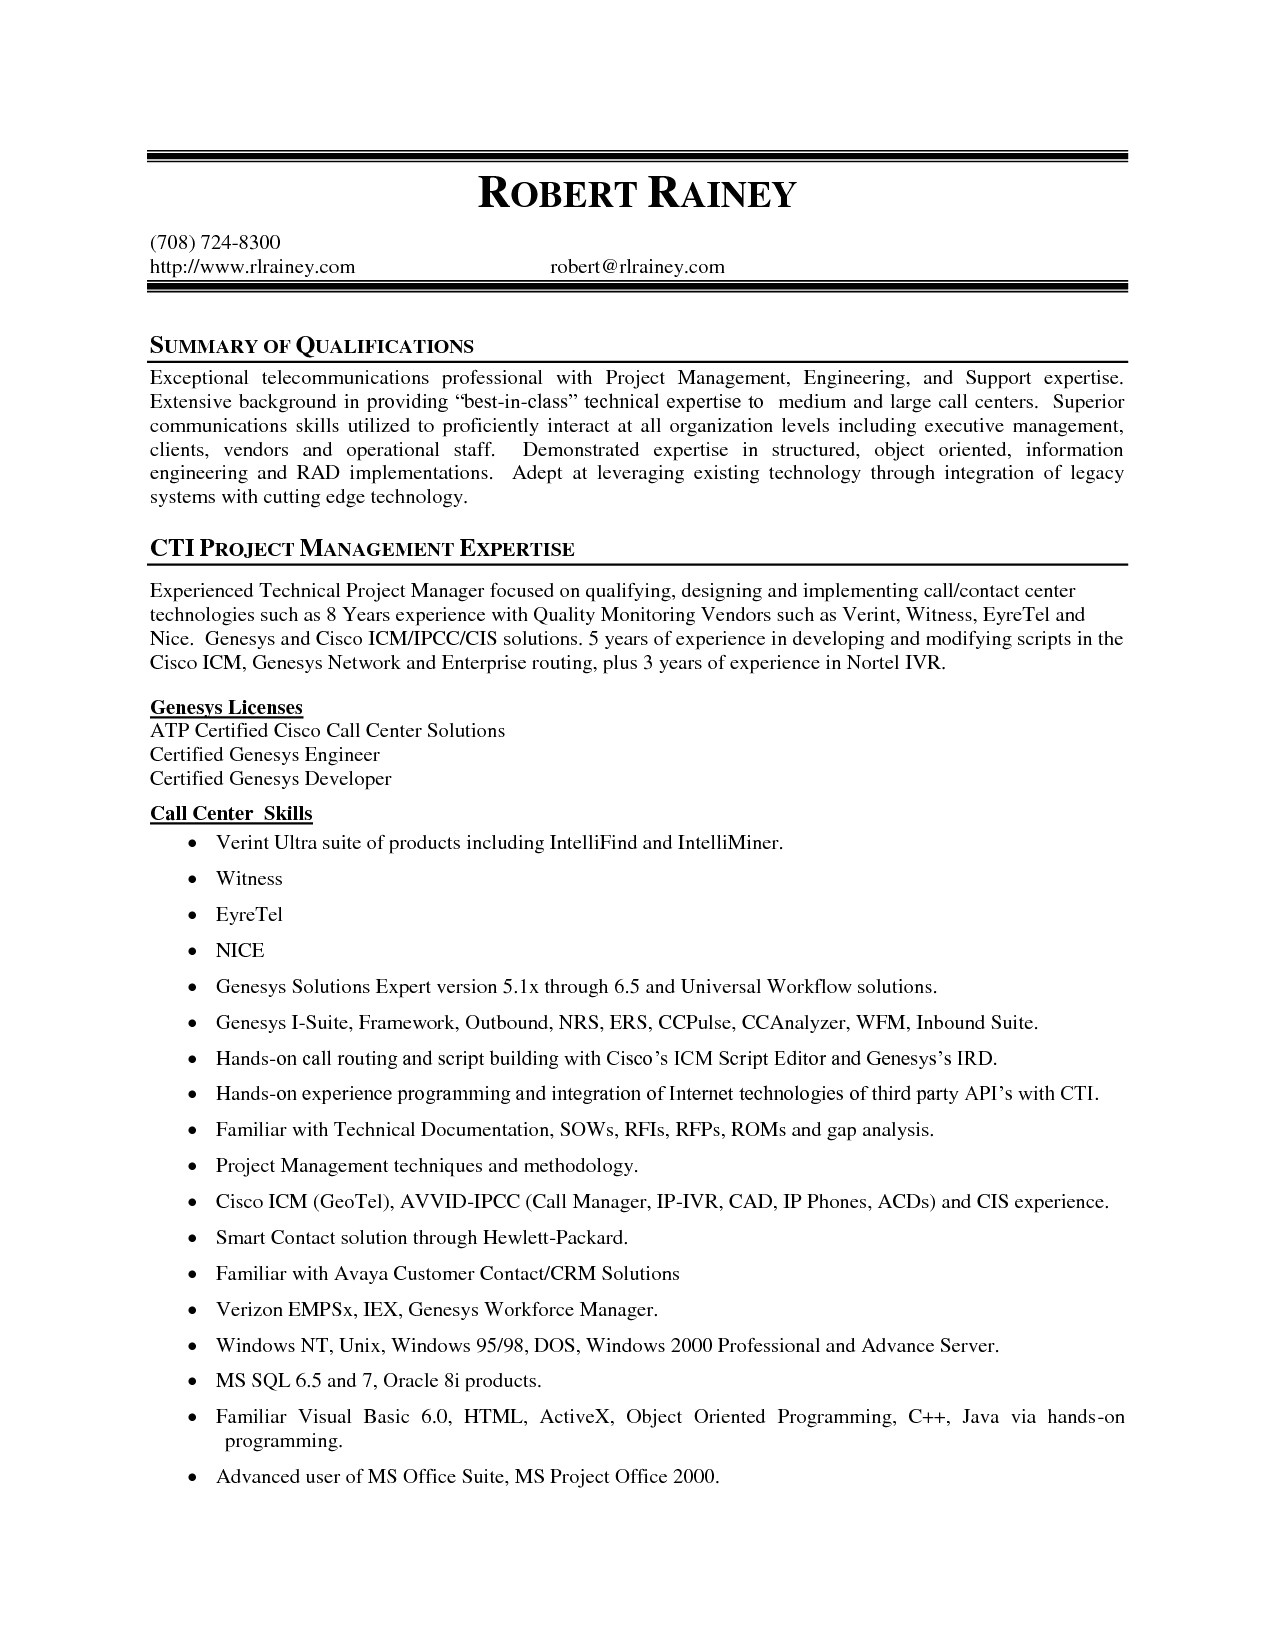 Operation Manager Resume Sample Doc 11 Elegant Construction Project Manager Resume Sample Doc